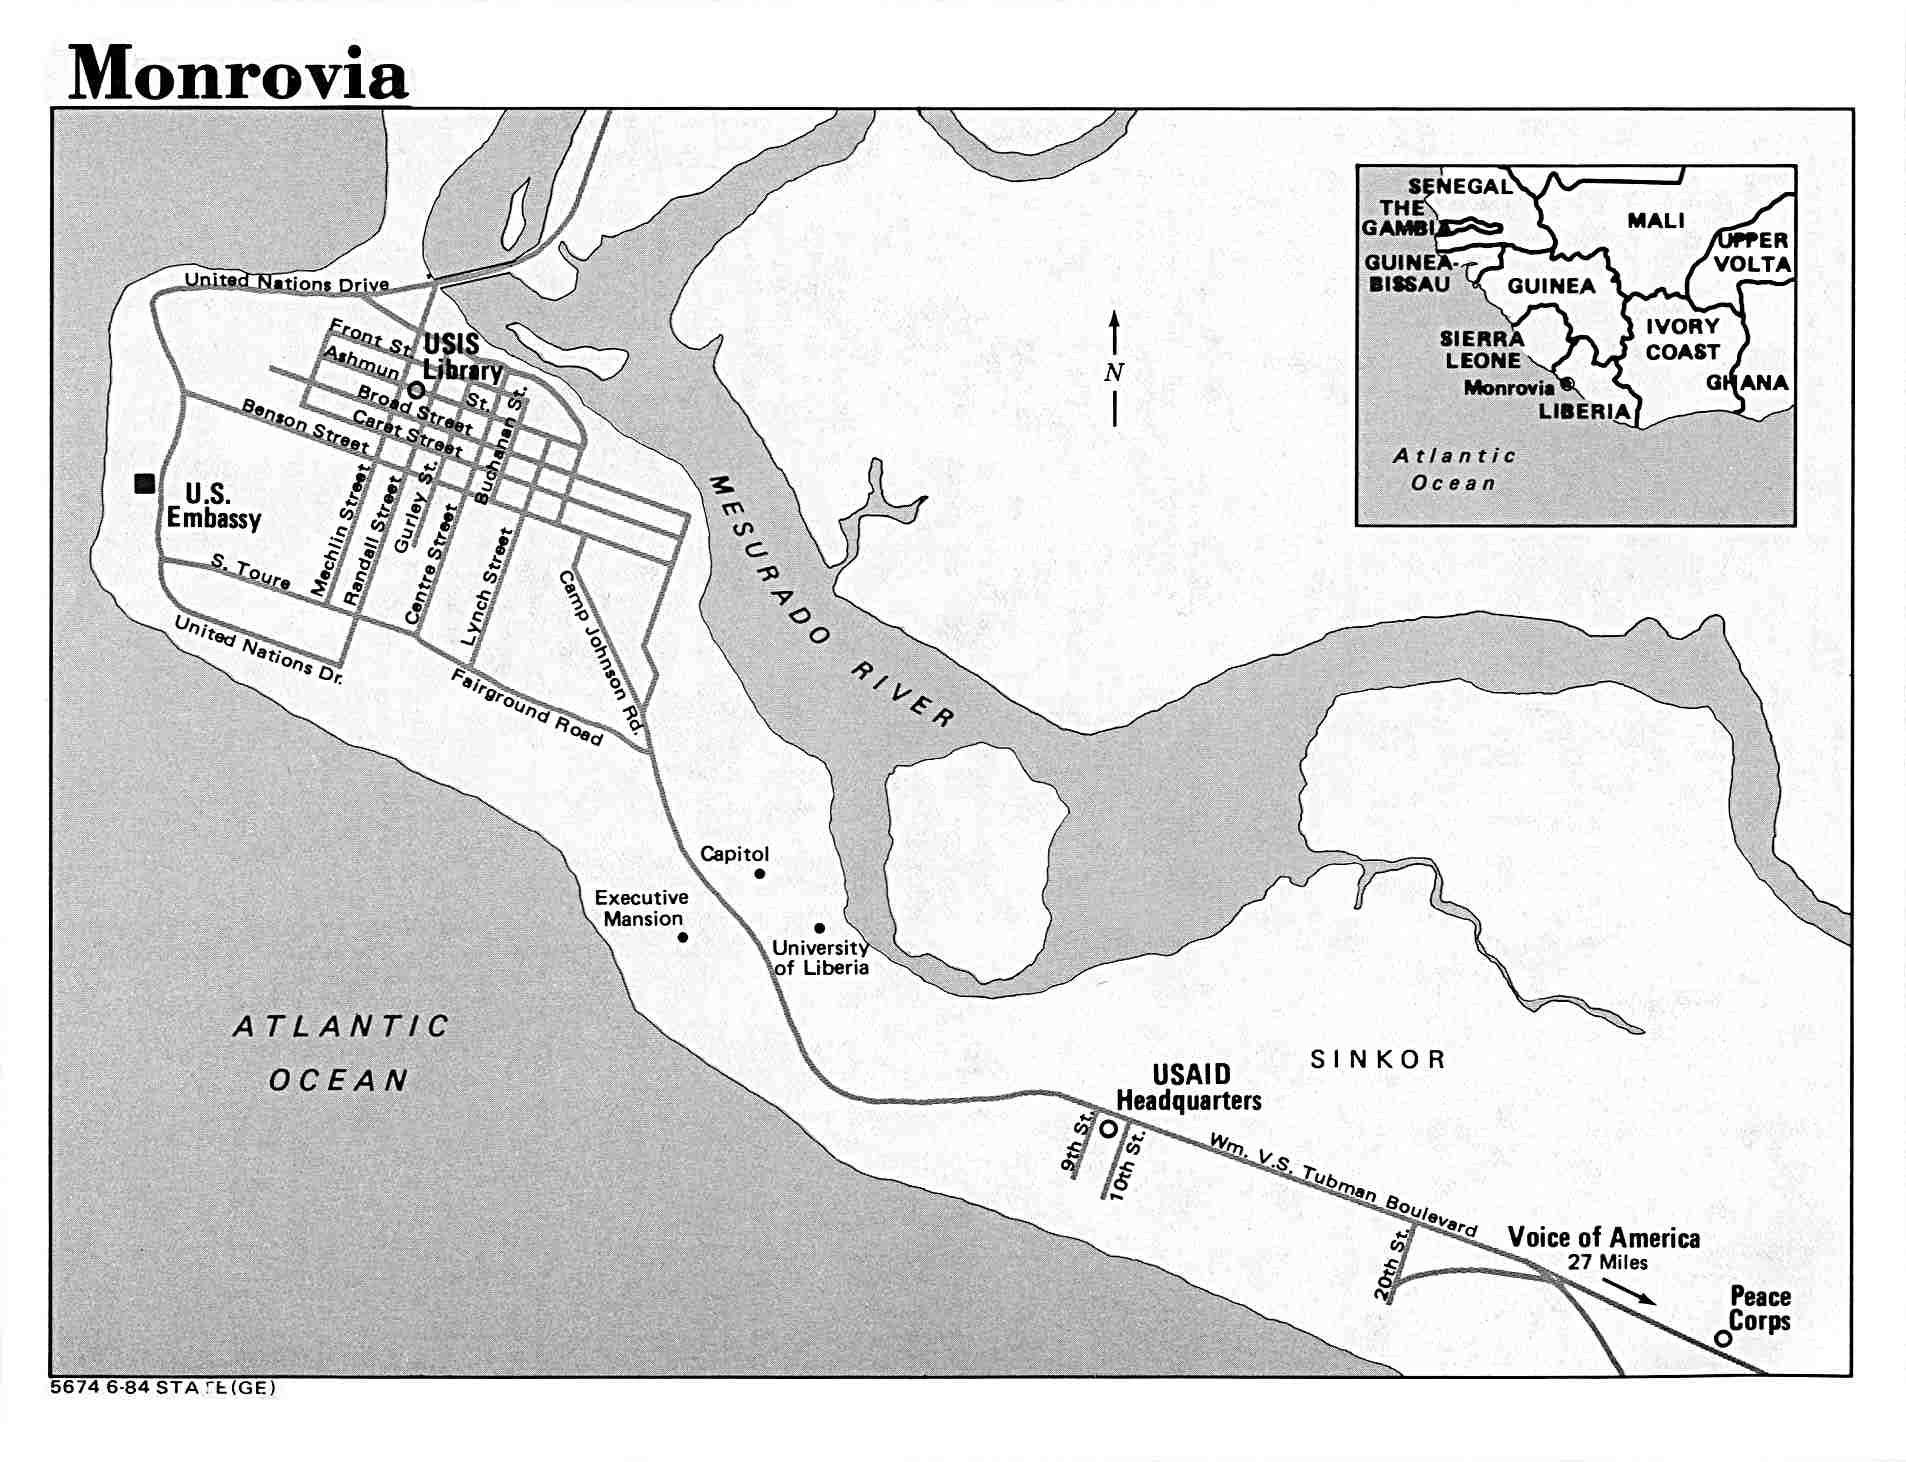 http://www.lib.utexas.edu/maps/world_cities/monrovia.jpg